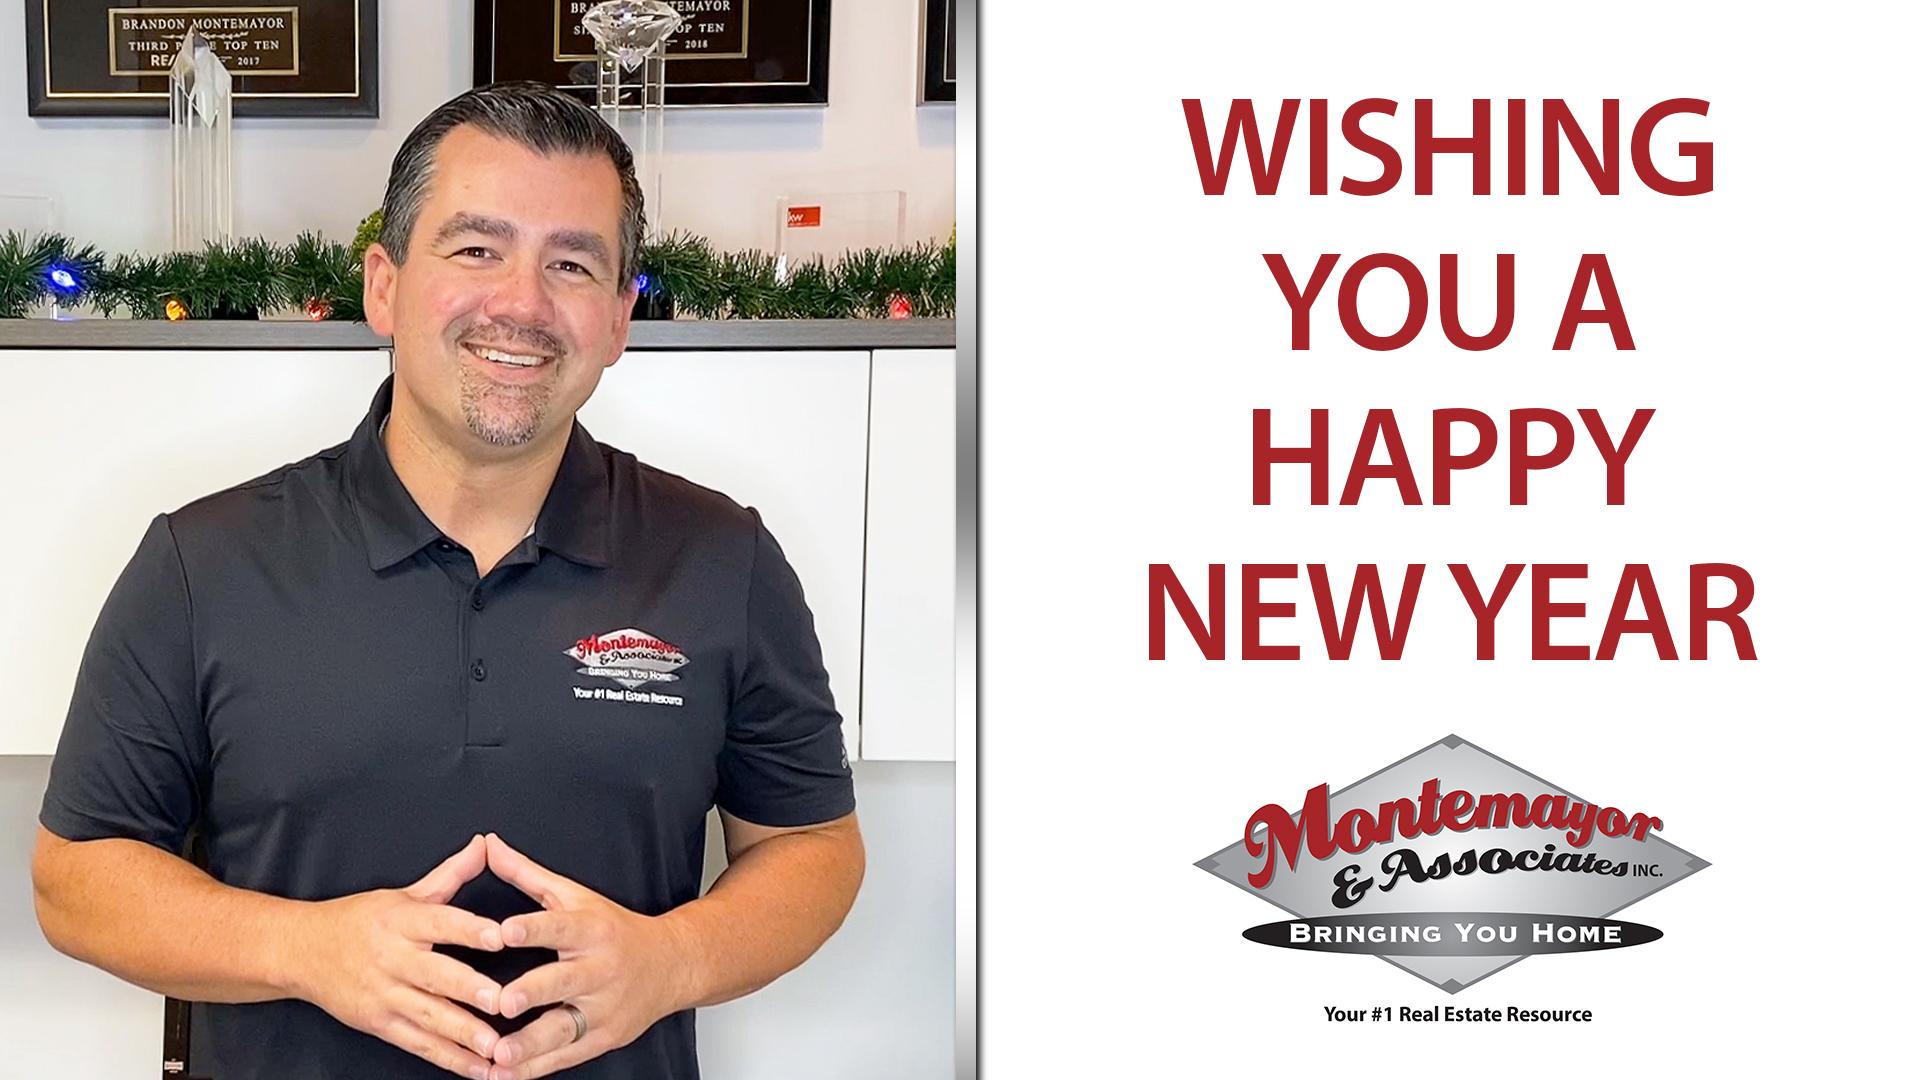 Montemayor & Associates Wish You a Happy New Year